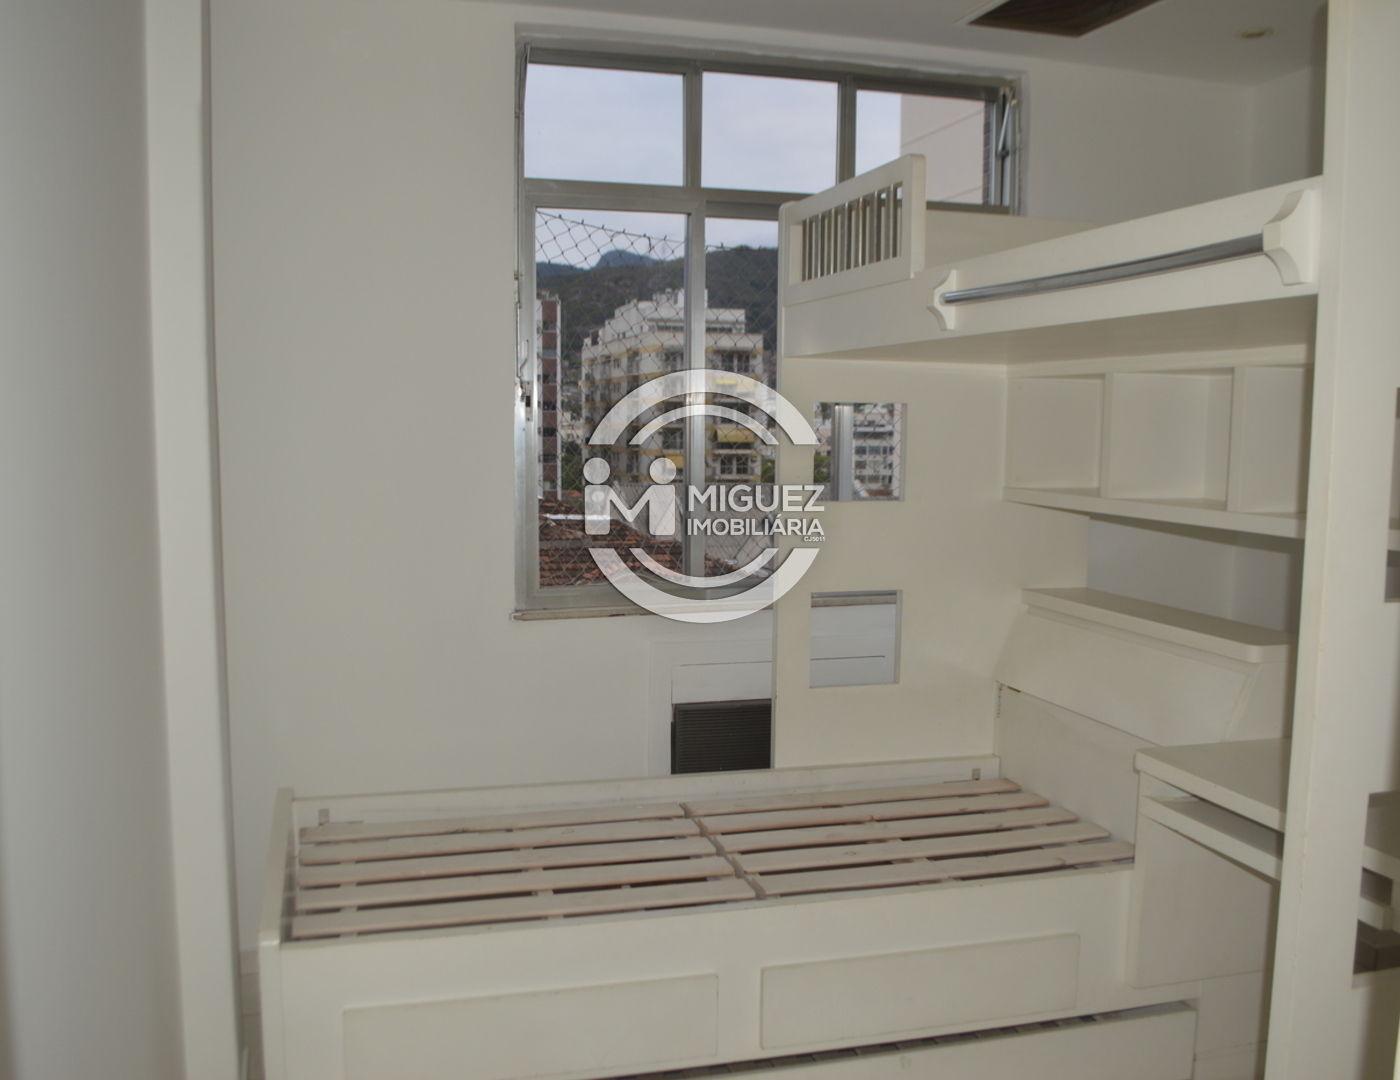 Apartamento, aluguel, RUA VISCONDE DE SANTA ISABEL - Grajaú , Rio de janeiro